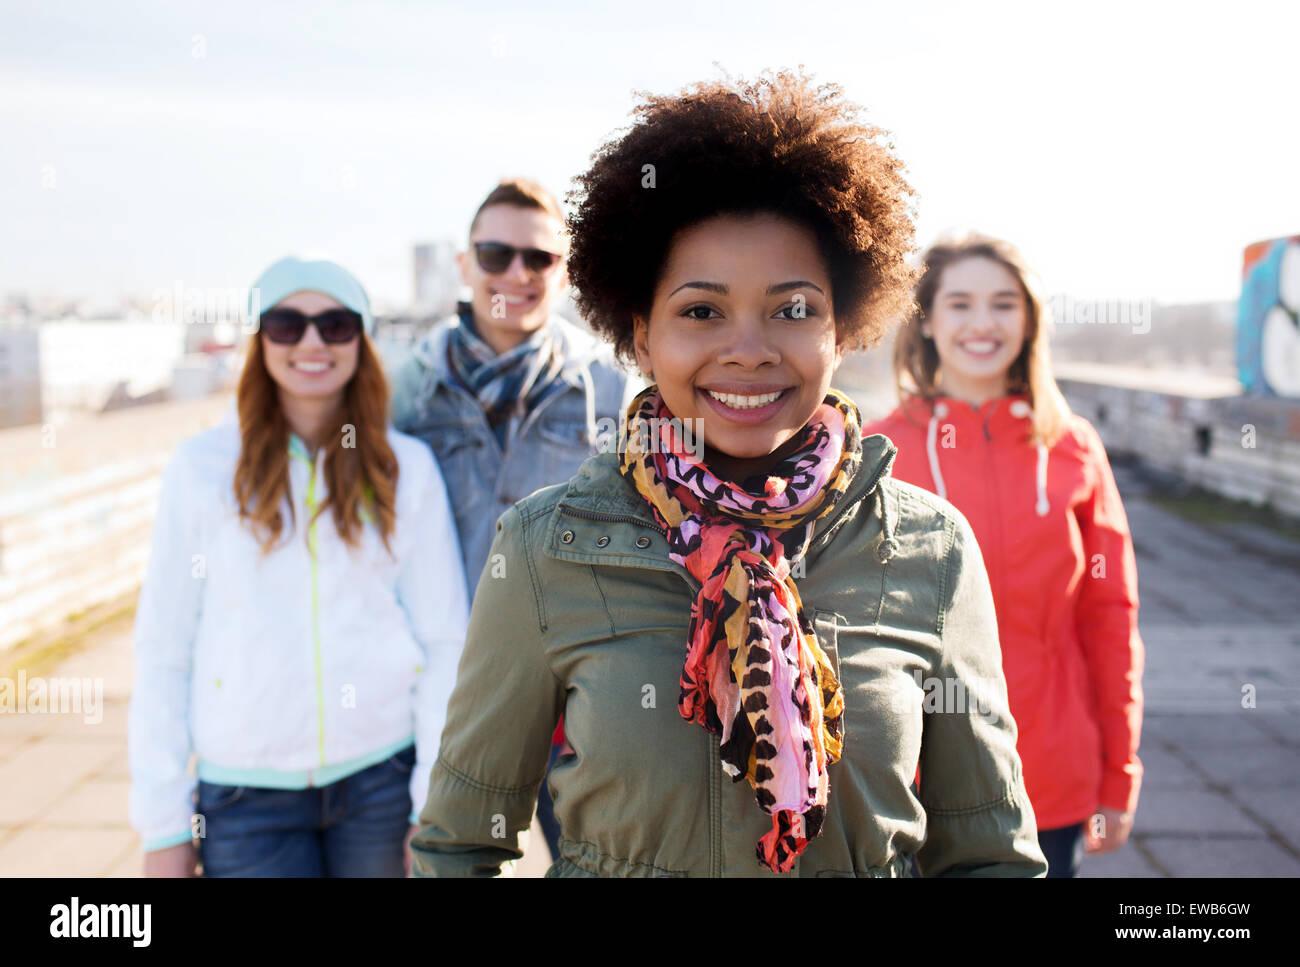 Groupe de professionnels amis adolescents on city street Photo Stock